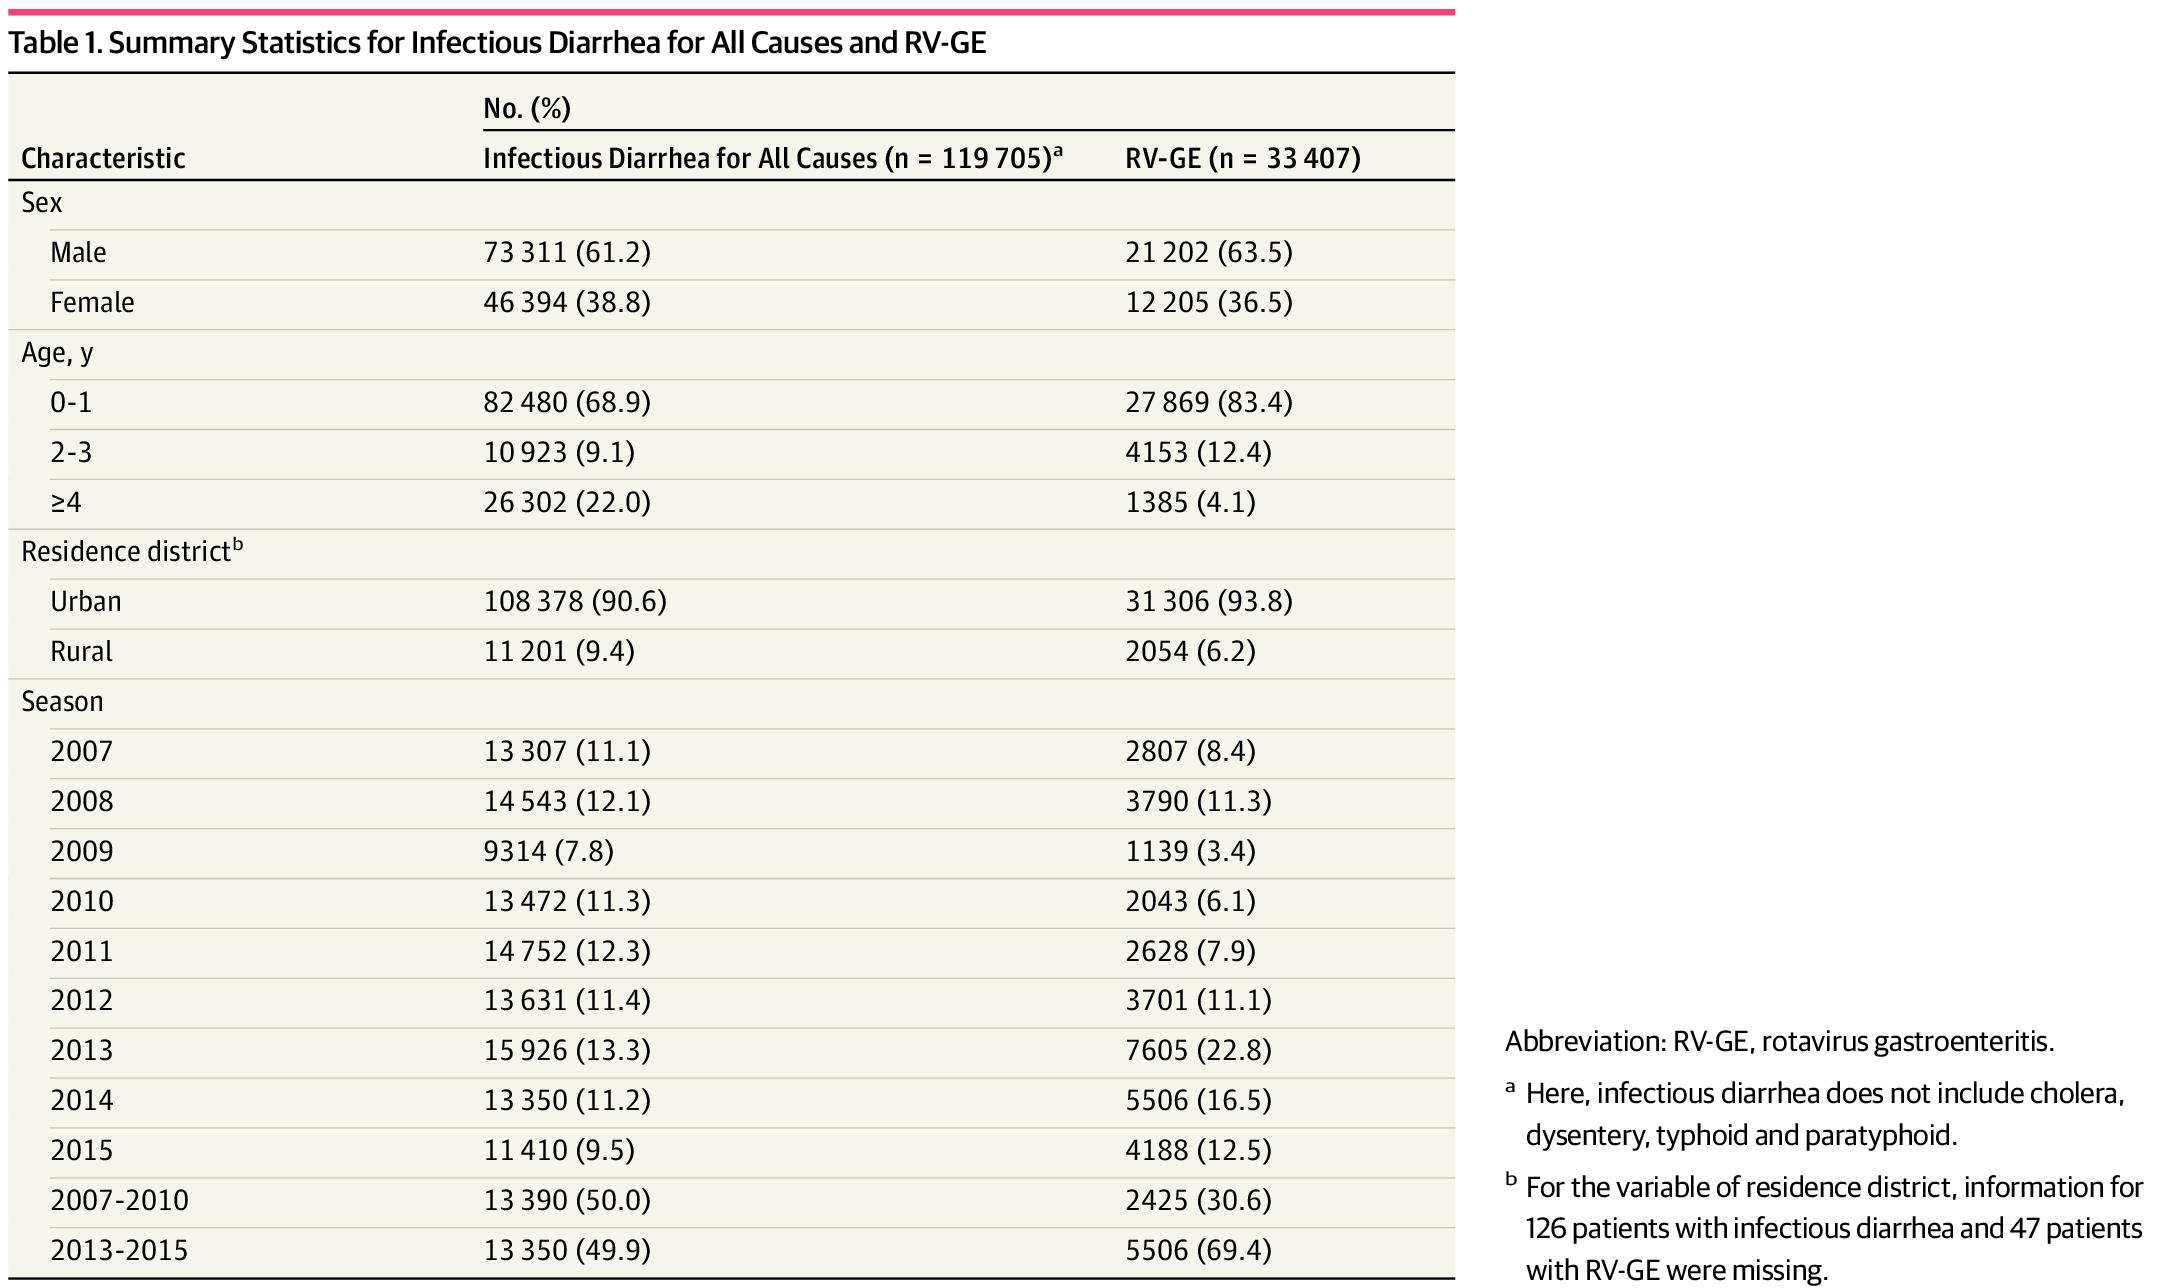 Rotavirus Gastroenteritis Infection Among Children